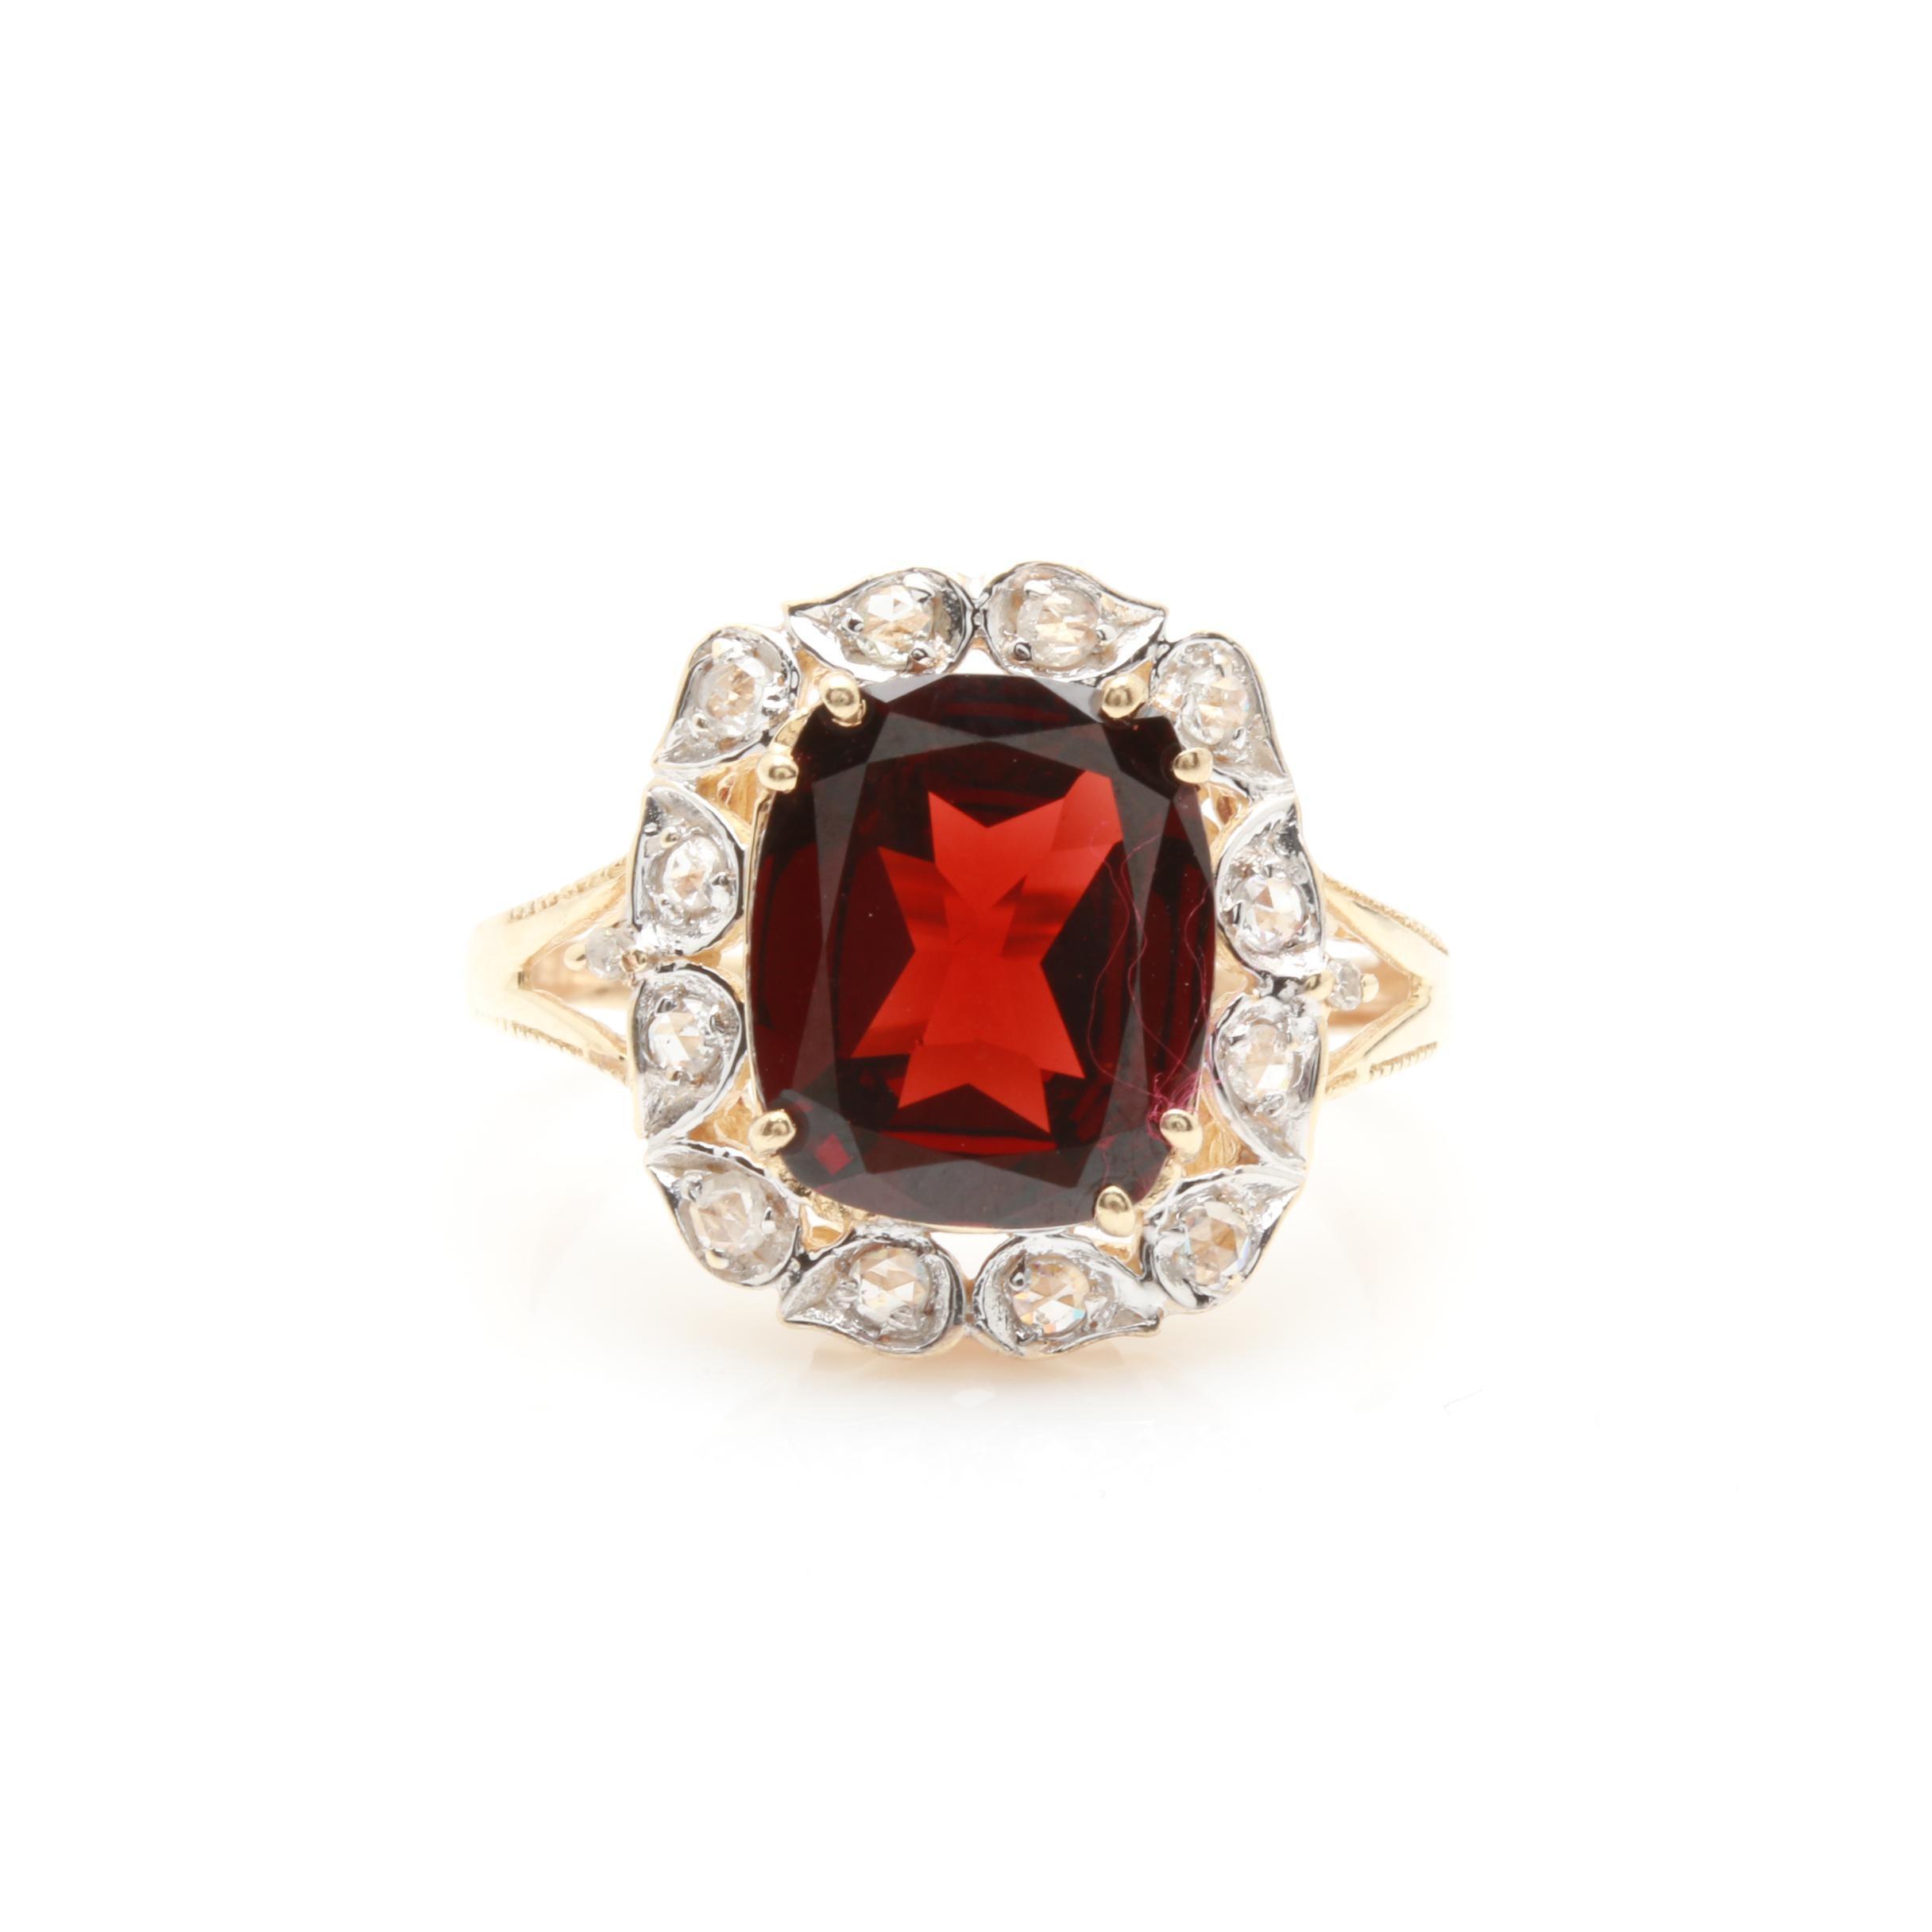 10K Yellow Gold Garnet and Diamond Ring